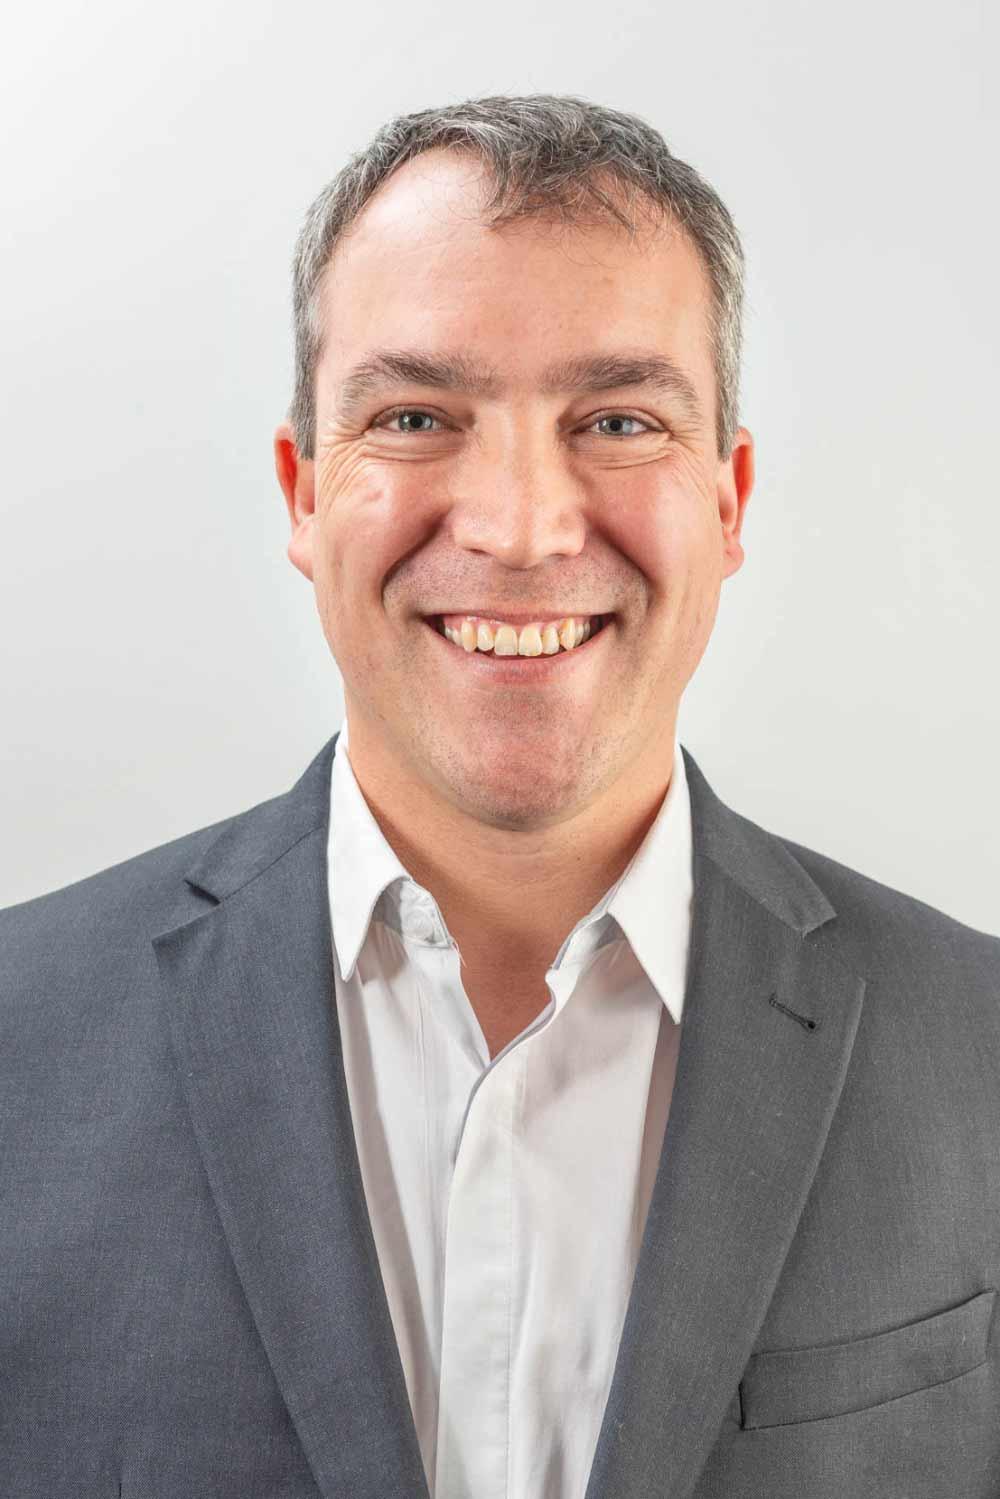 Jonathan Dalton - Technical director of Viridis Australia